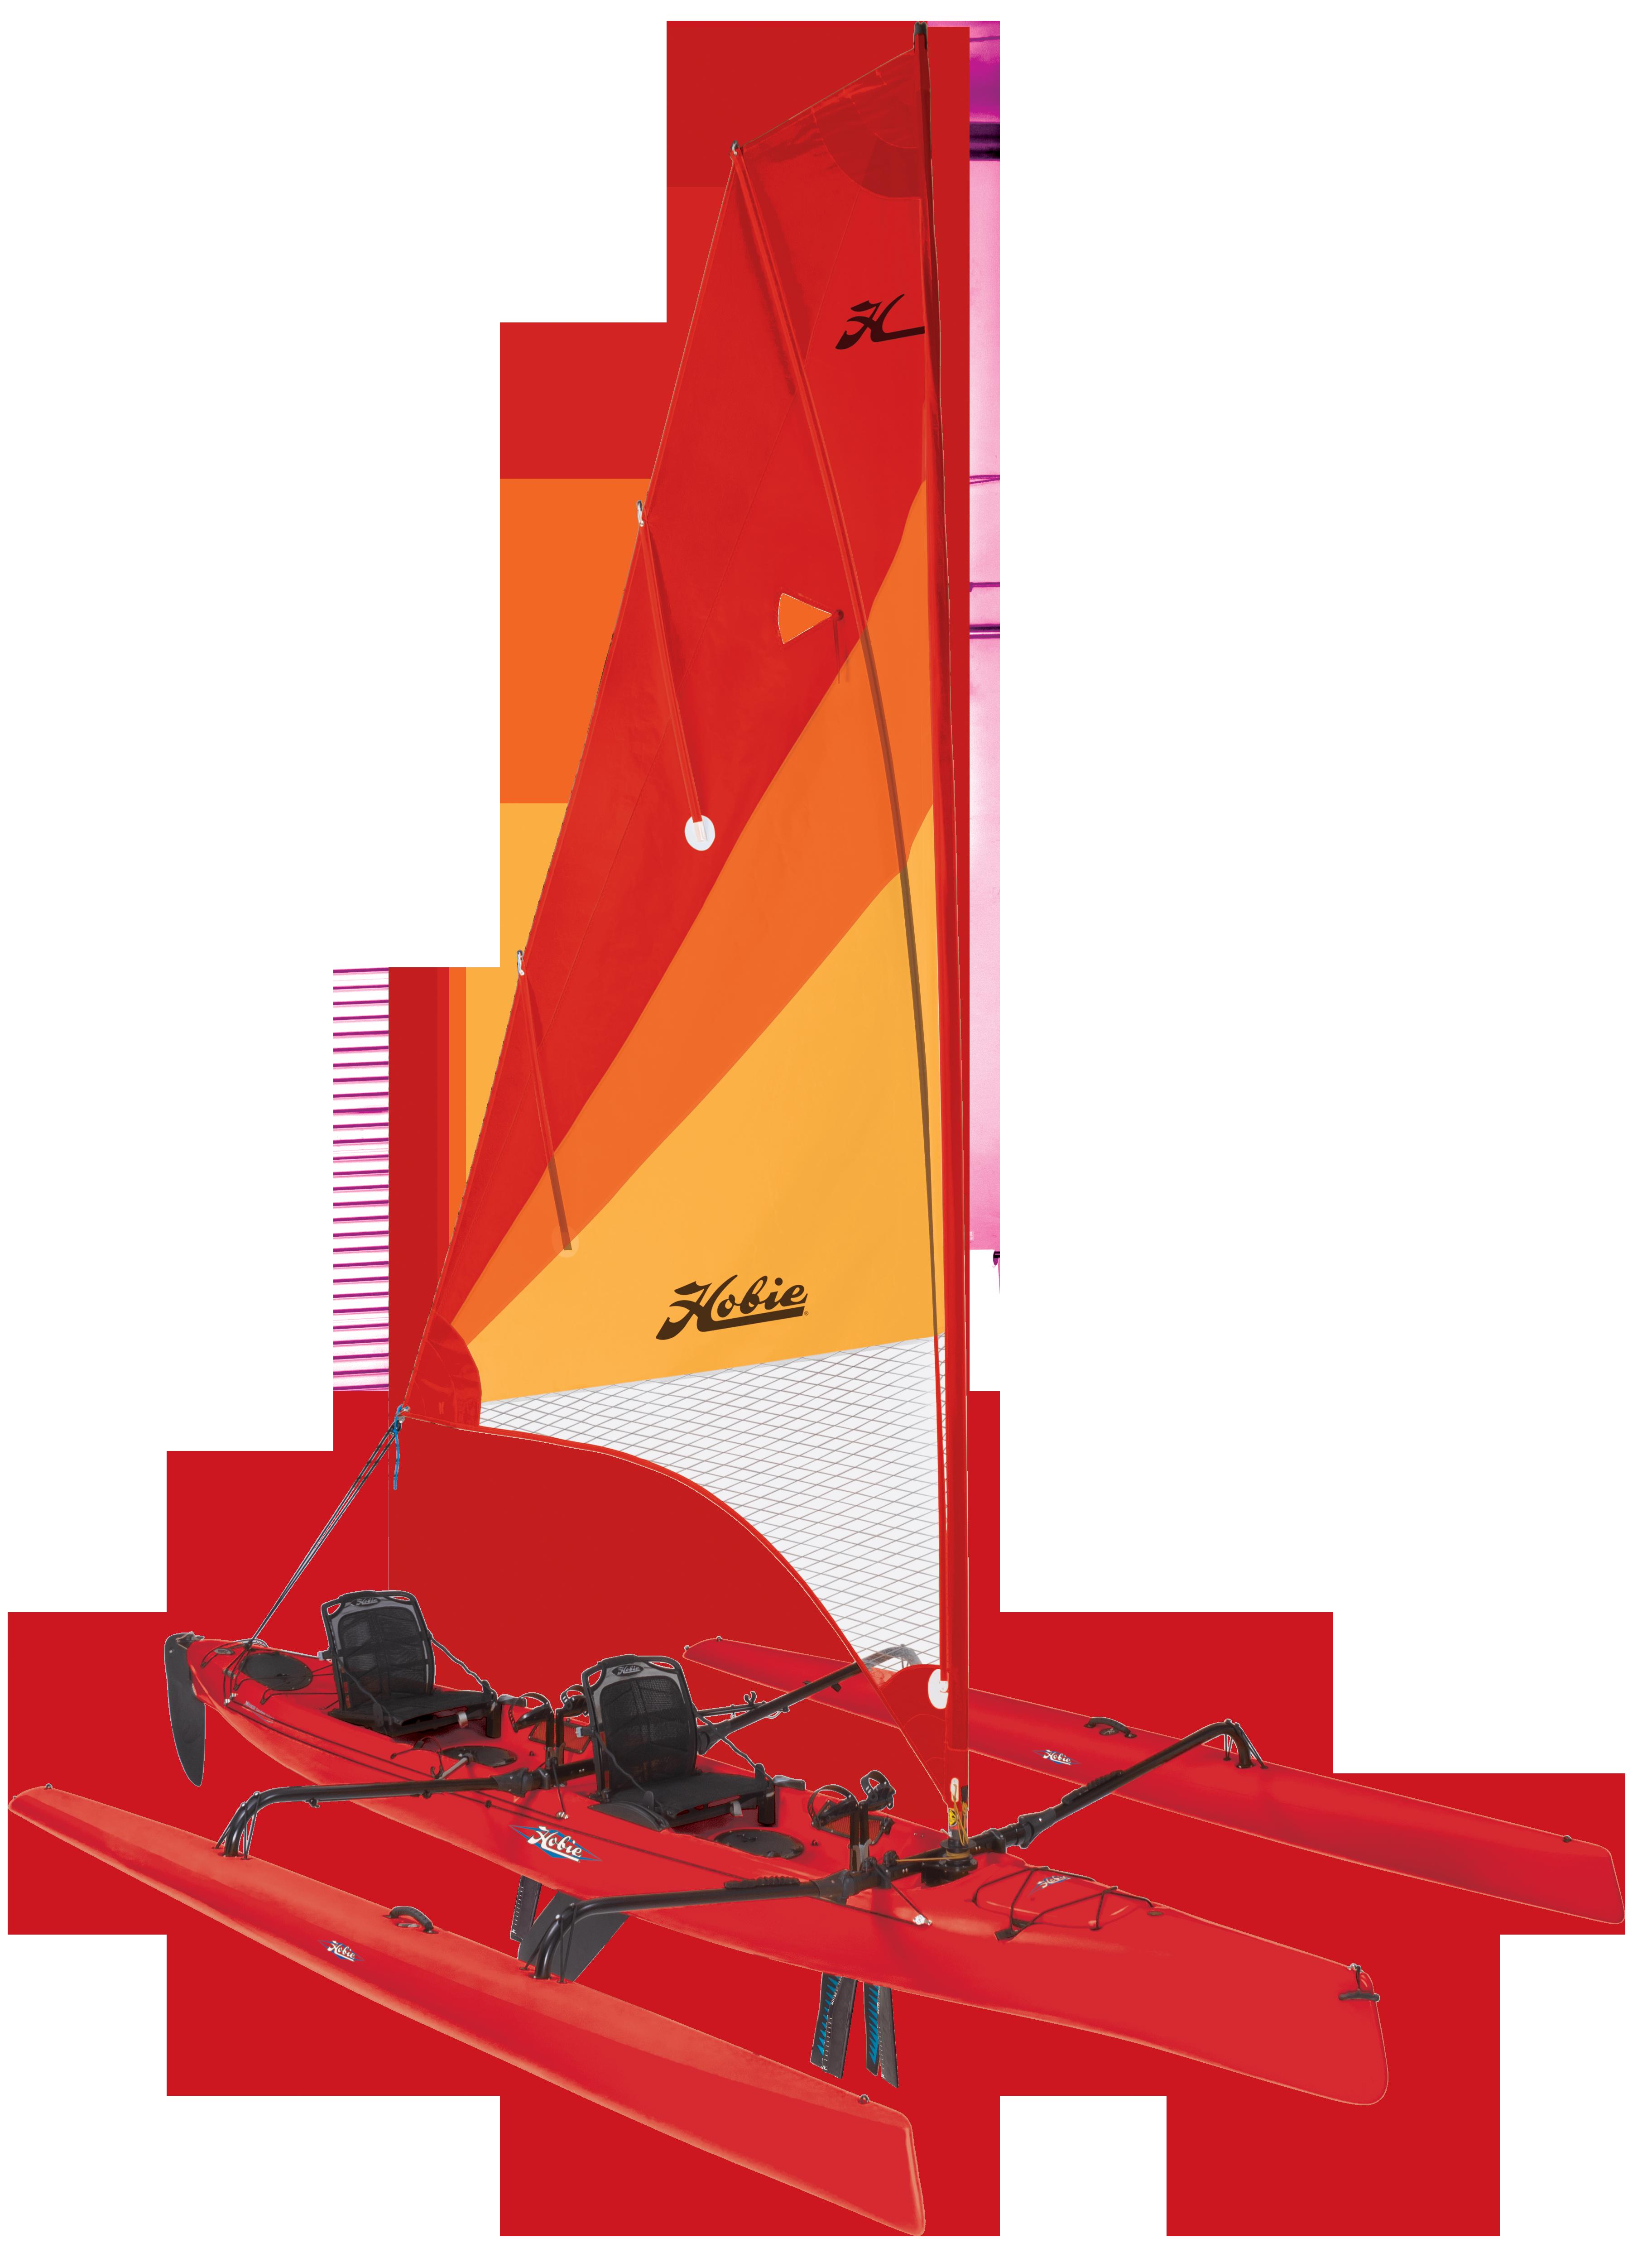 Hobie Tandem Island Kayak - Sailer!